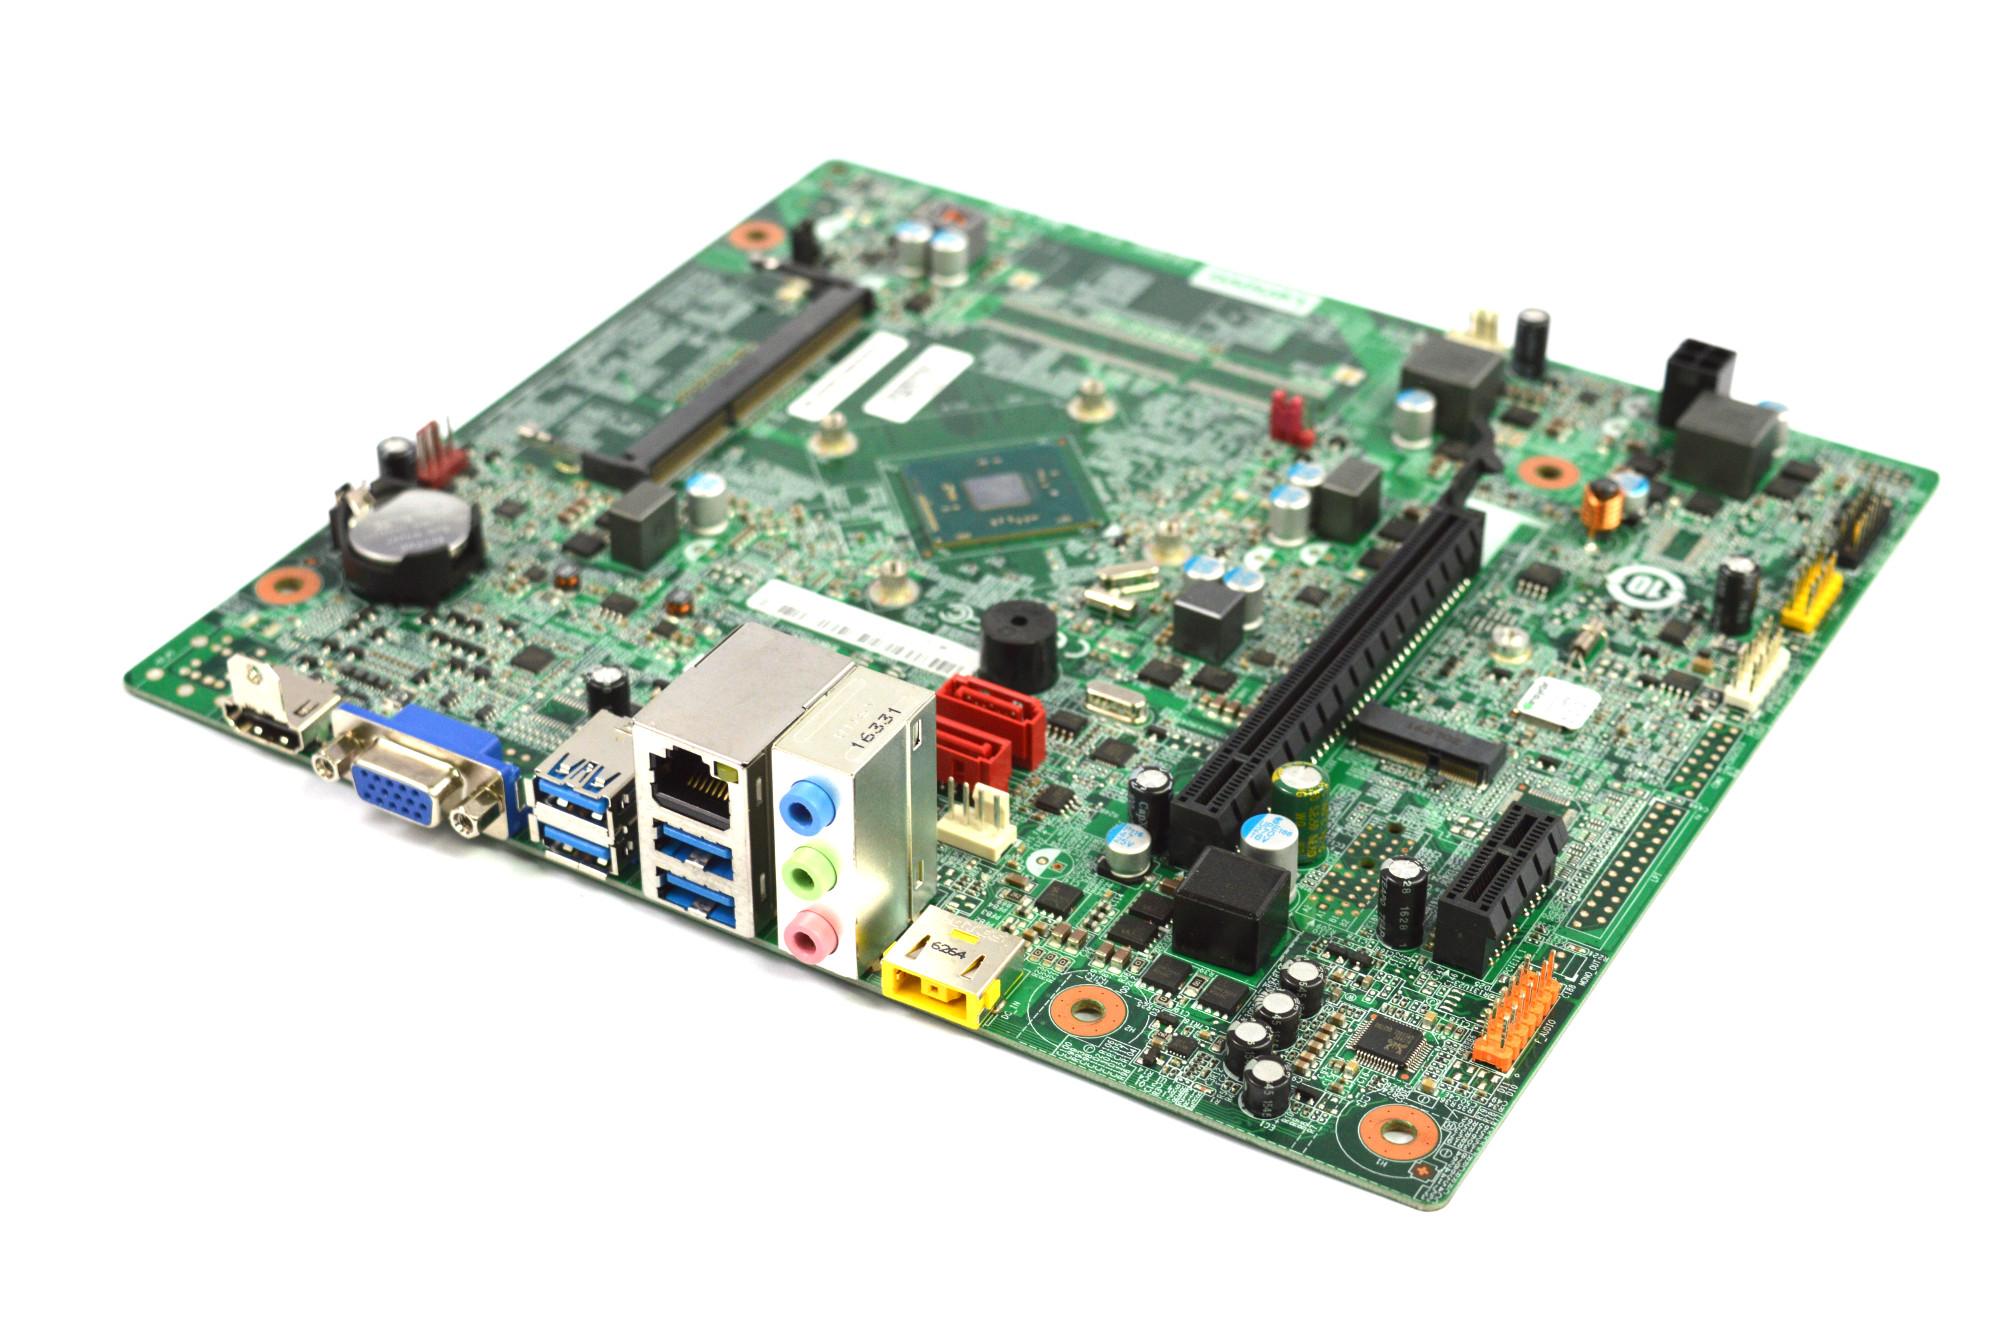 01AJ066 Lenovo Motherboard /w Intel Celeron 1.6GHz N3050 CPU /f Ideacentre 300S